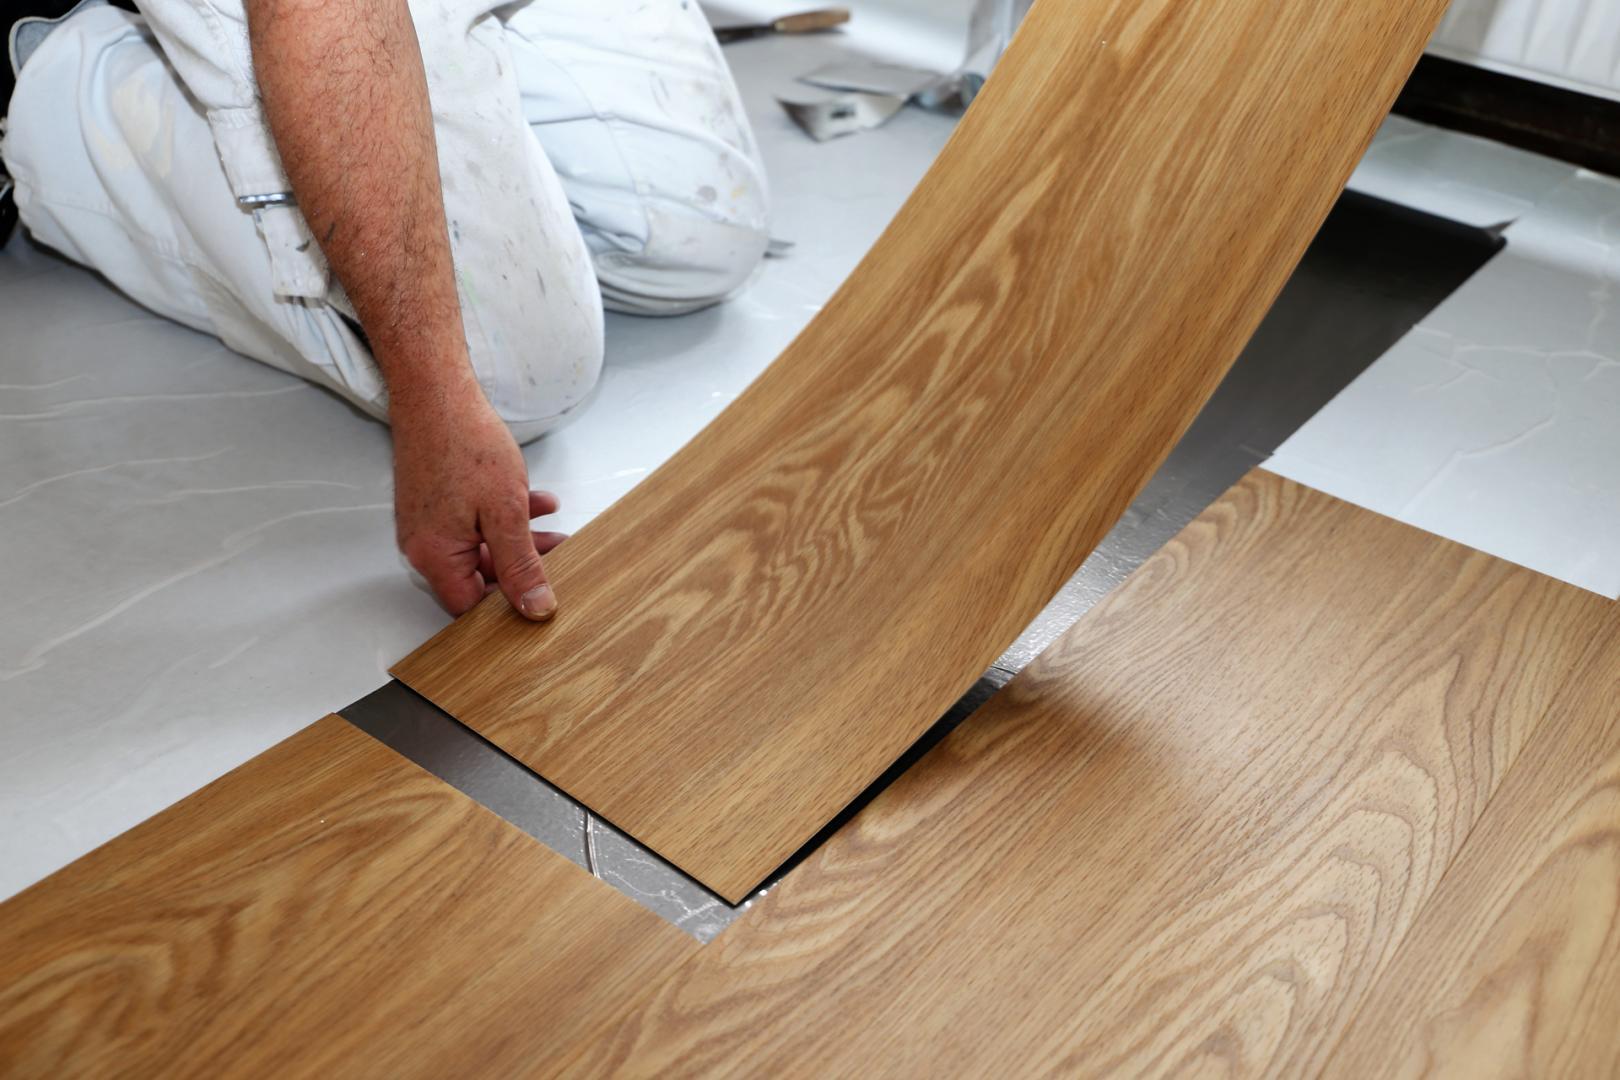 Vinyl Flooring Melbourne Rockledge Palm Bay Got Wood Inc